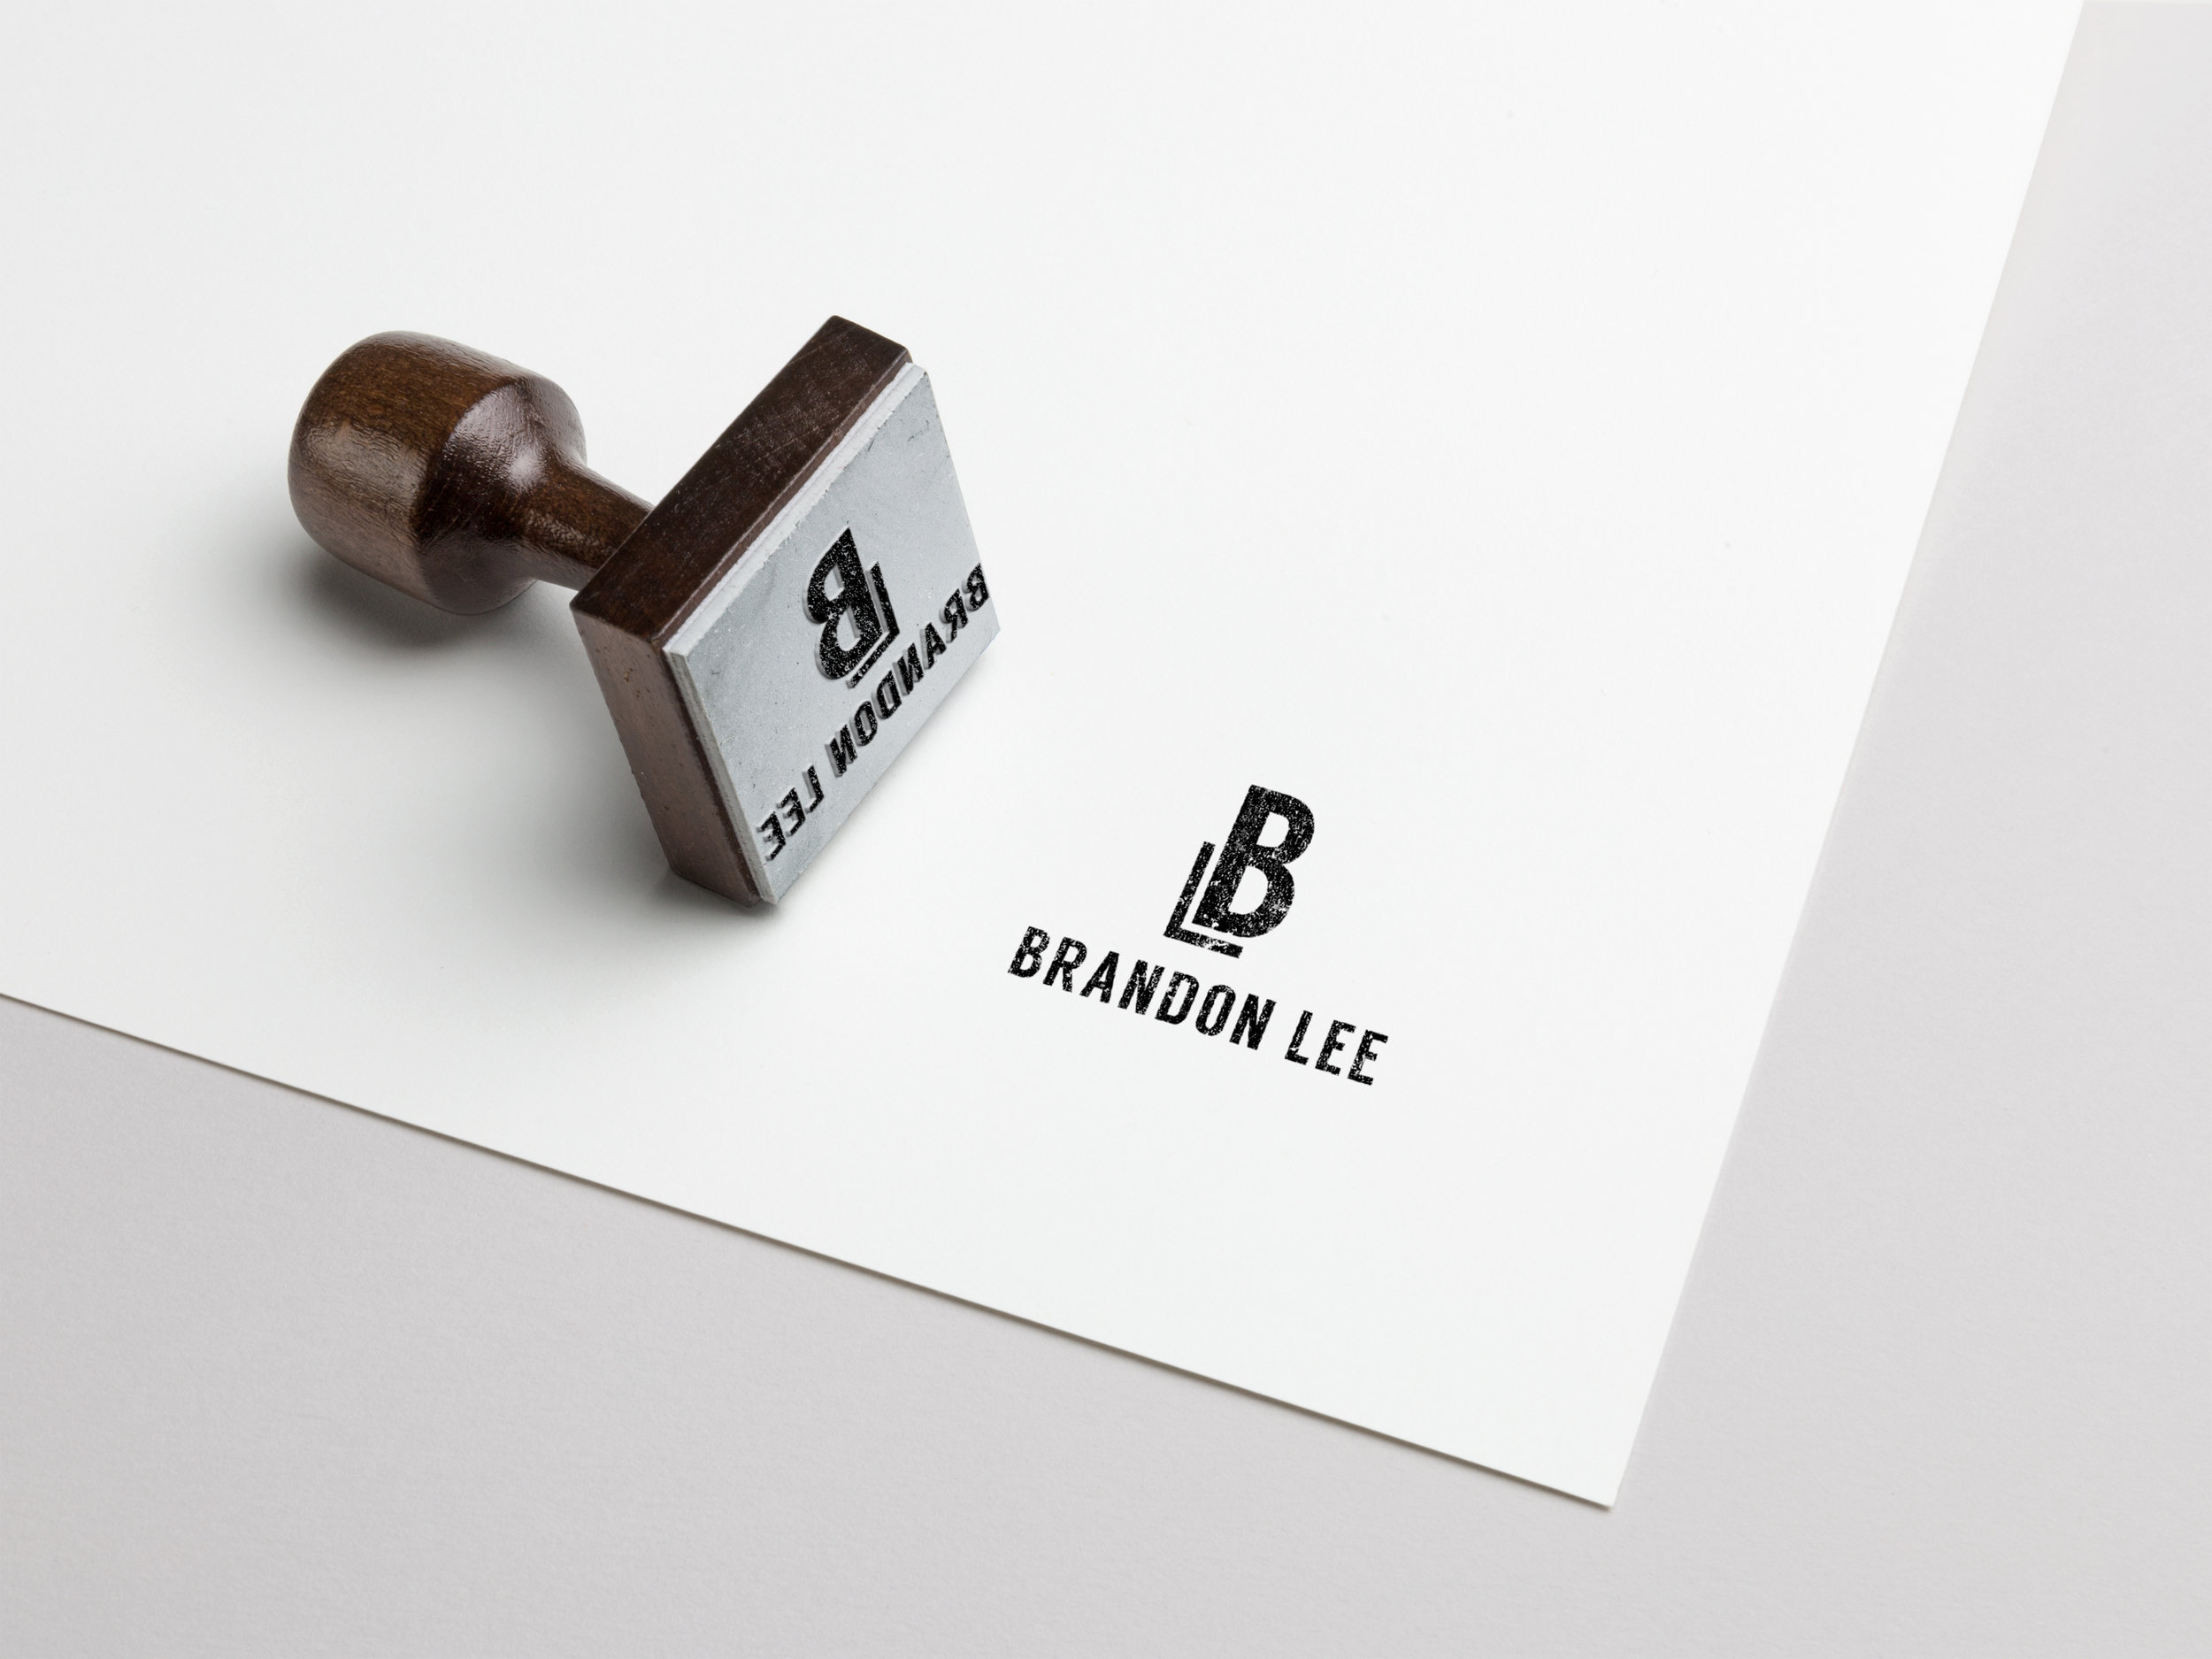 Brandon Lee - Brand IDENTITY, WEBSITE DESIGN, Print & Merchandise Design